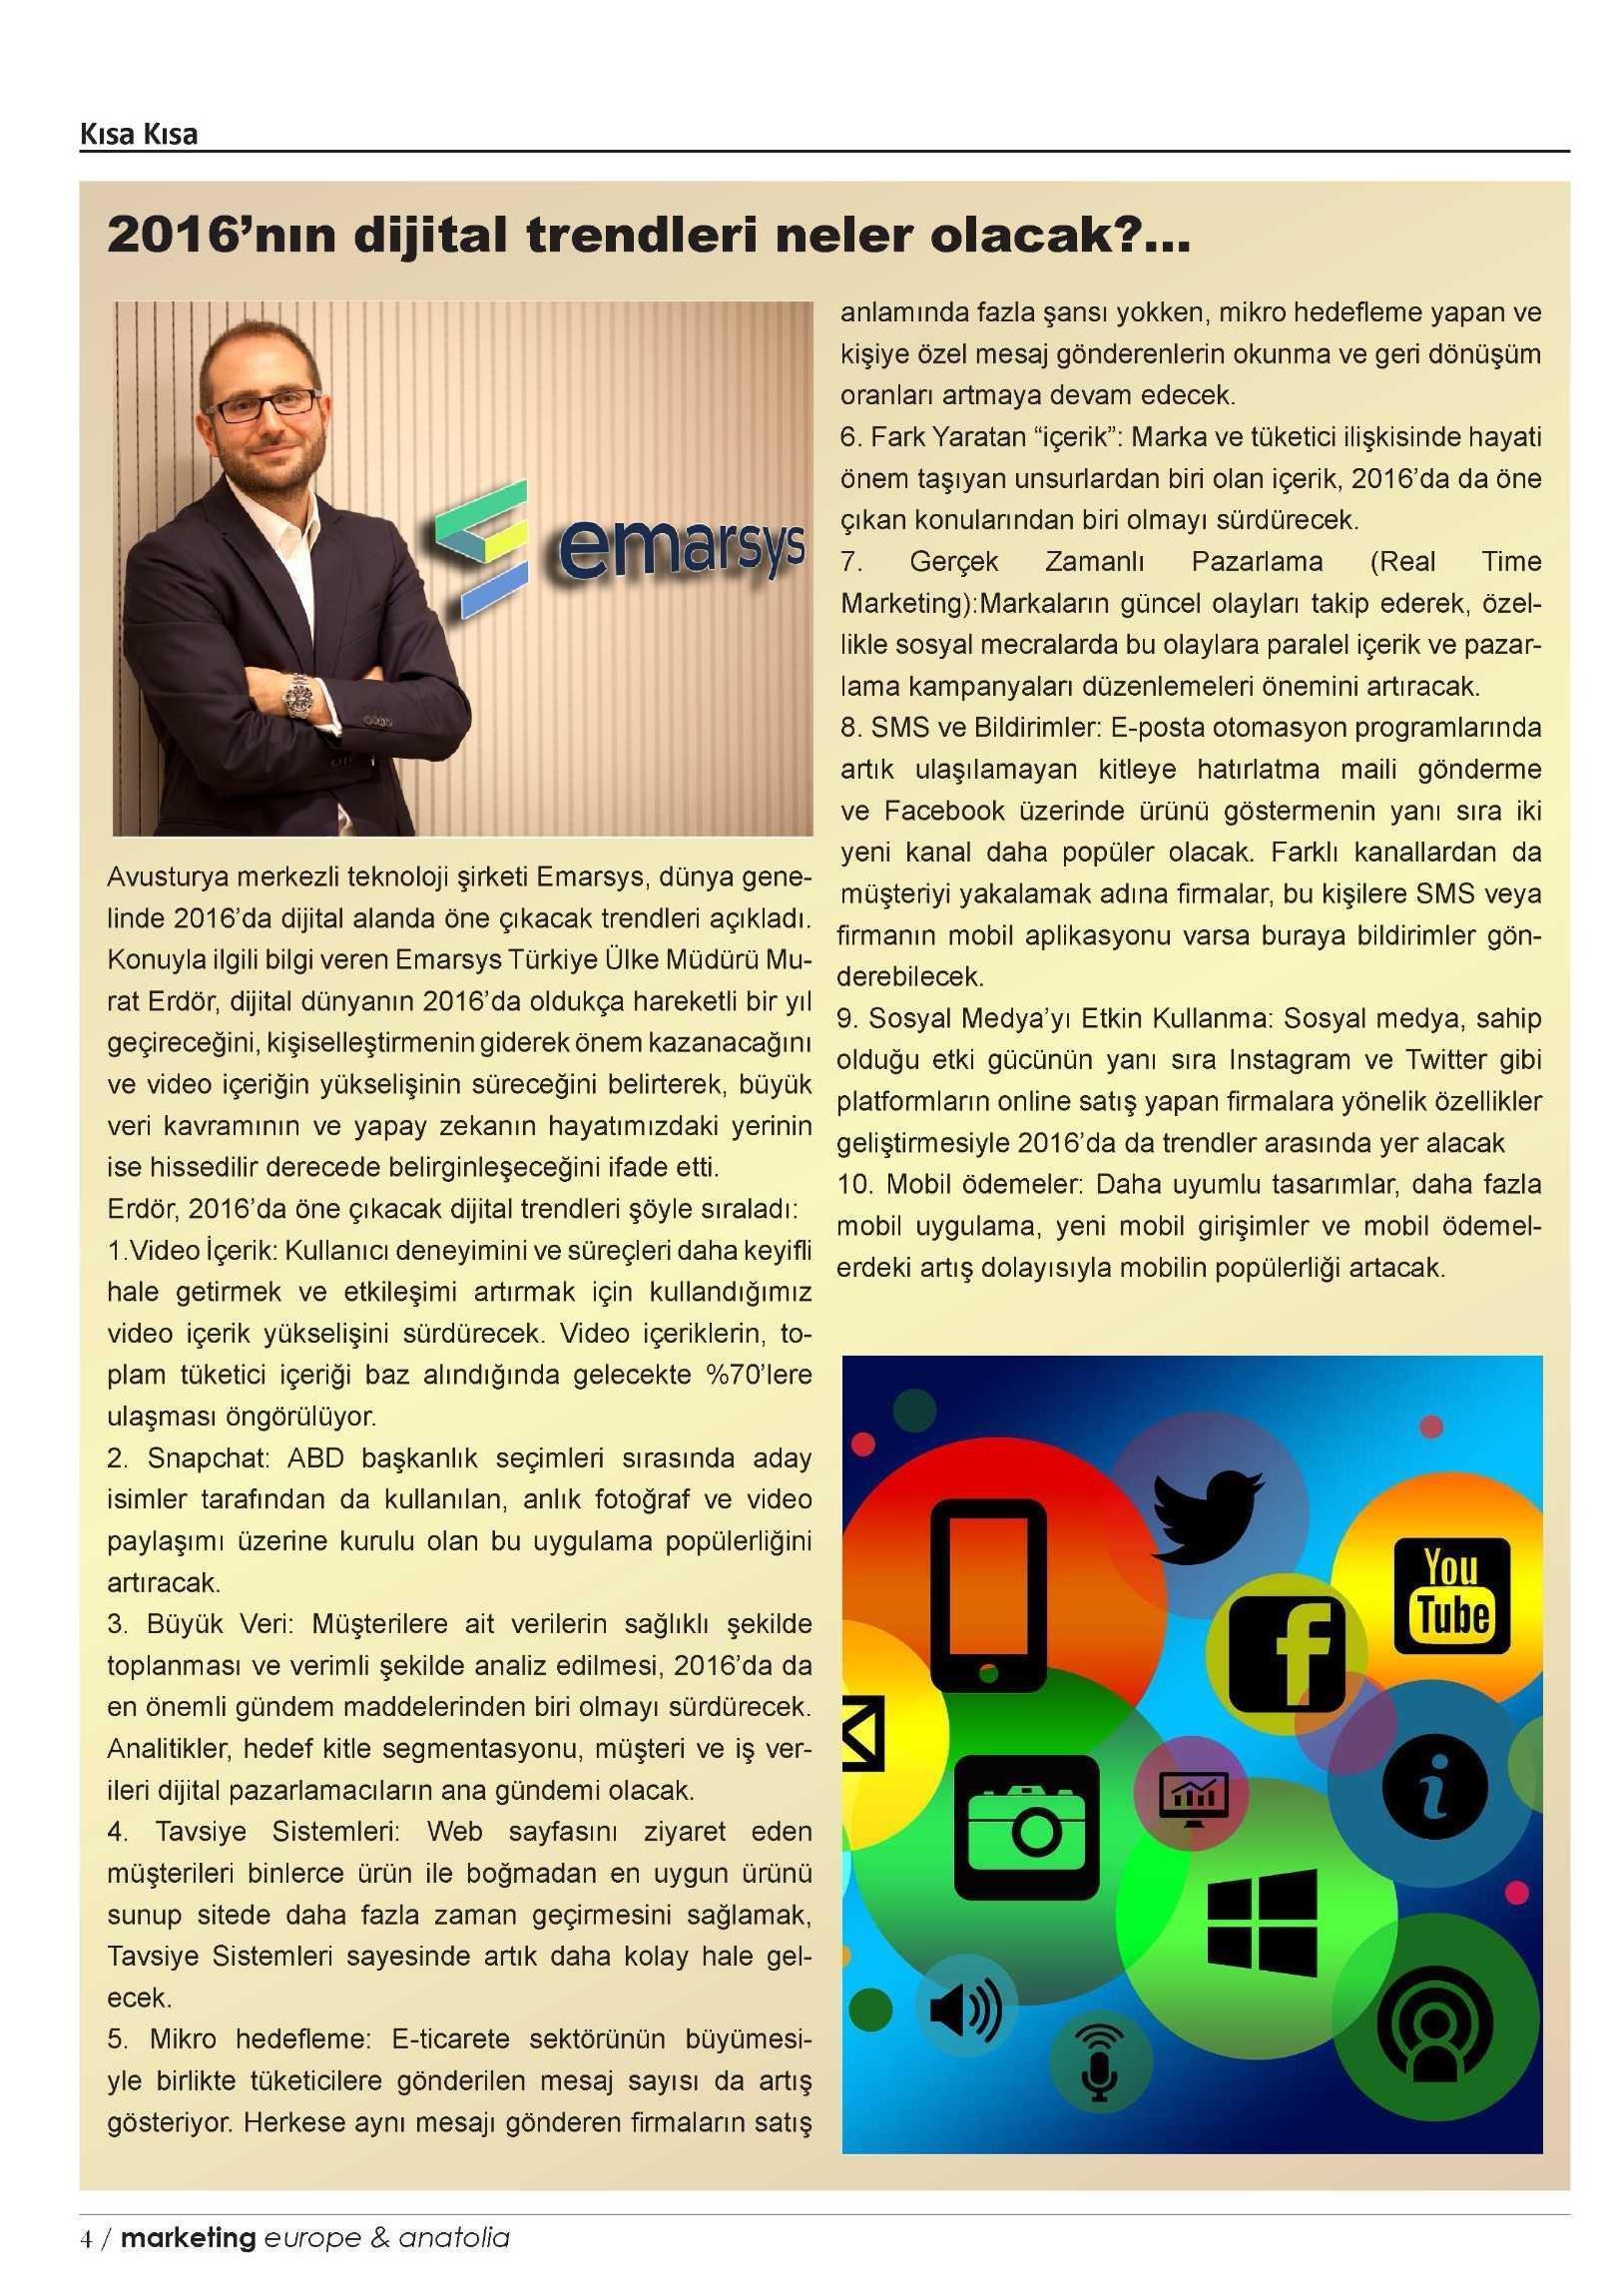 1 - Marketing Europe _ Anatolia Dergisi_muraterdor.com_Ocak 2016